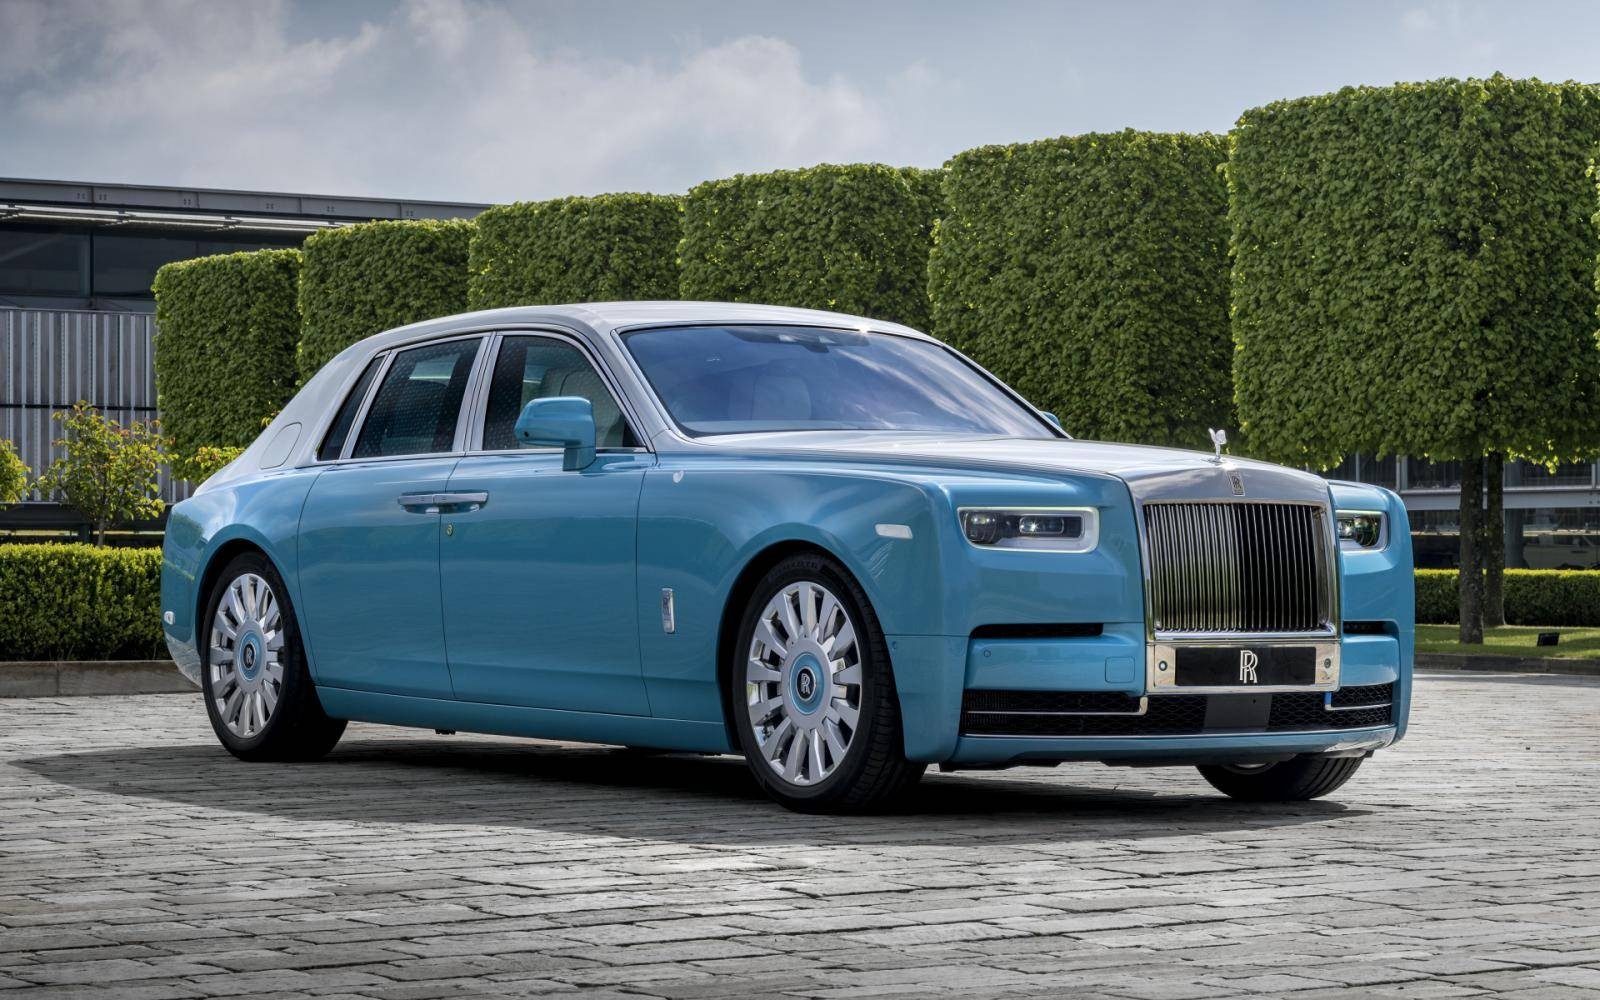 Rolls-Royce Phantom Bespoke: smaak zonder grenzen